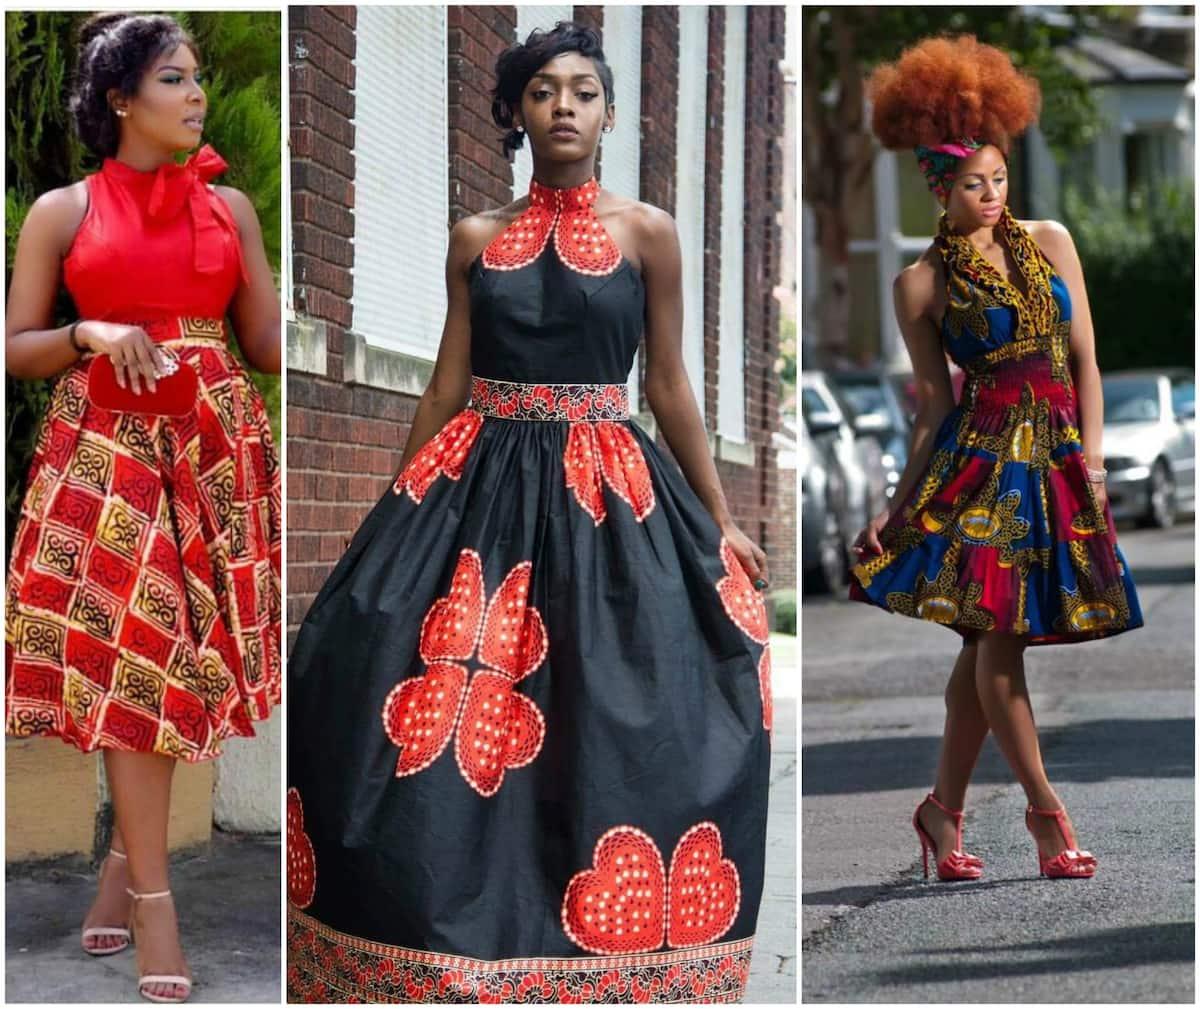 Best kitenge dress designs for weddings in Kenya